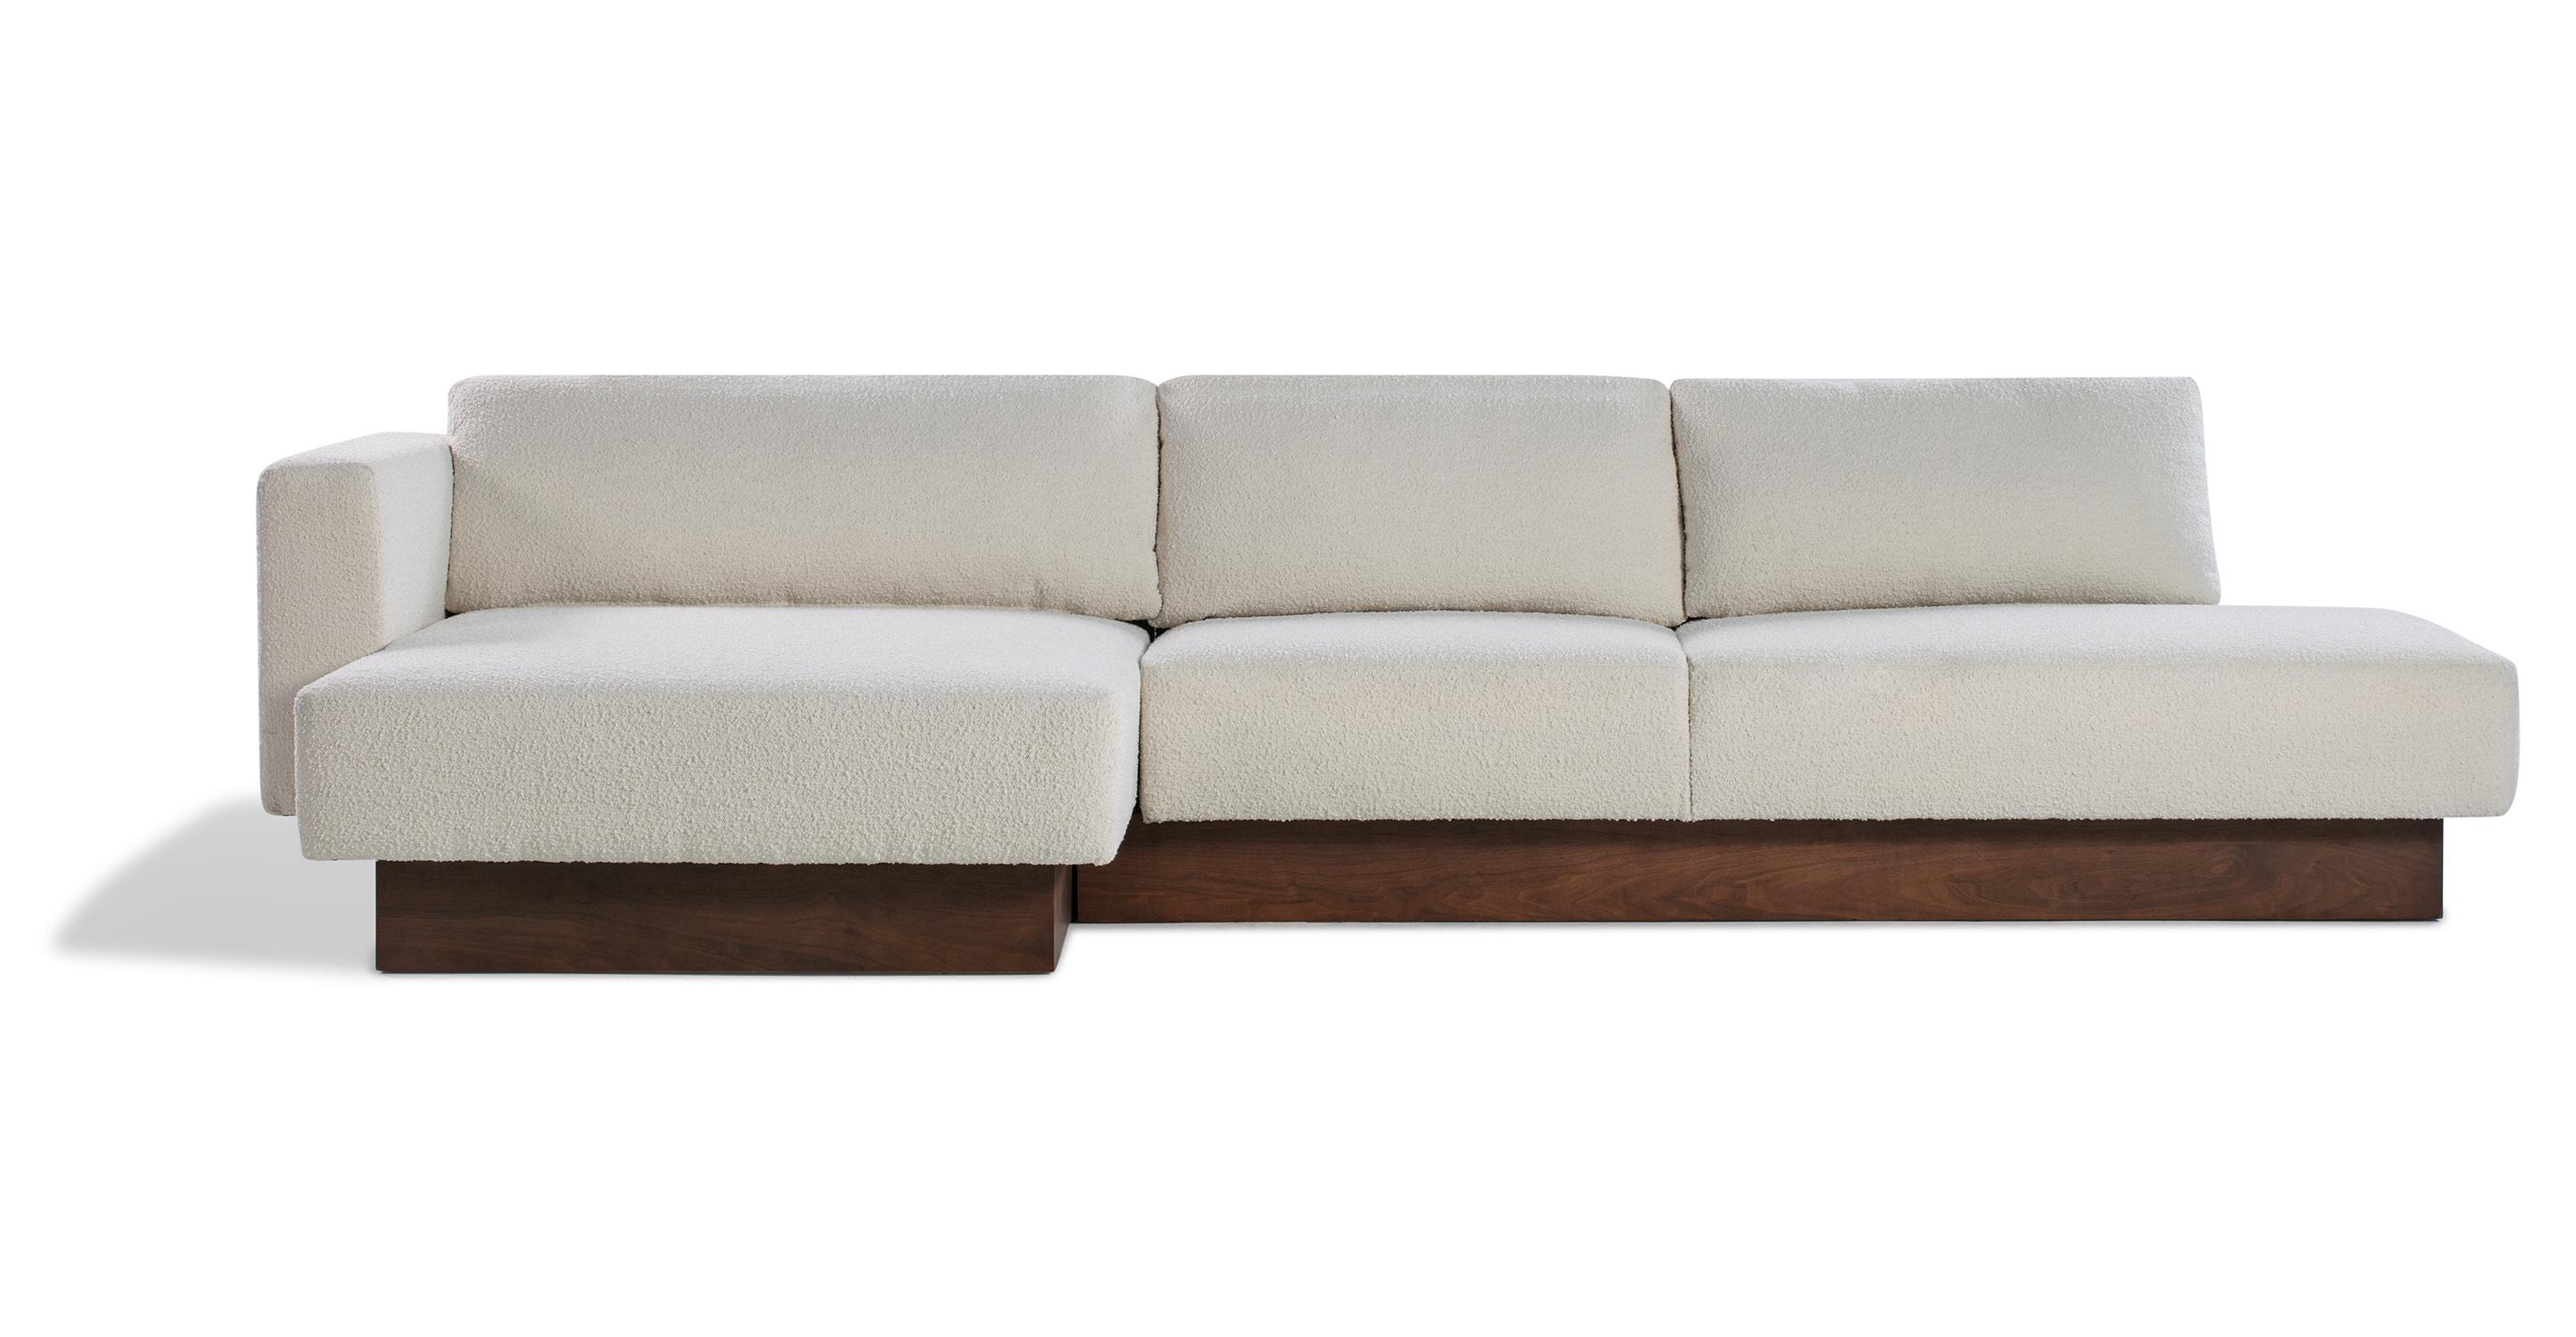 "Brady 128"" Fabric Sofa Sectional Left, Blanc Boucle"